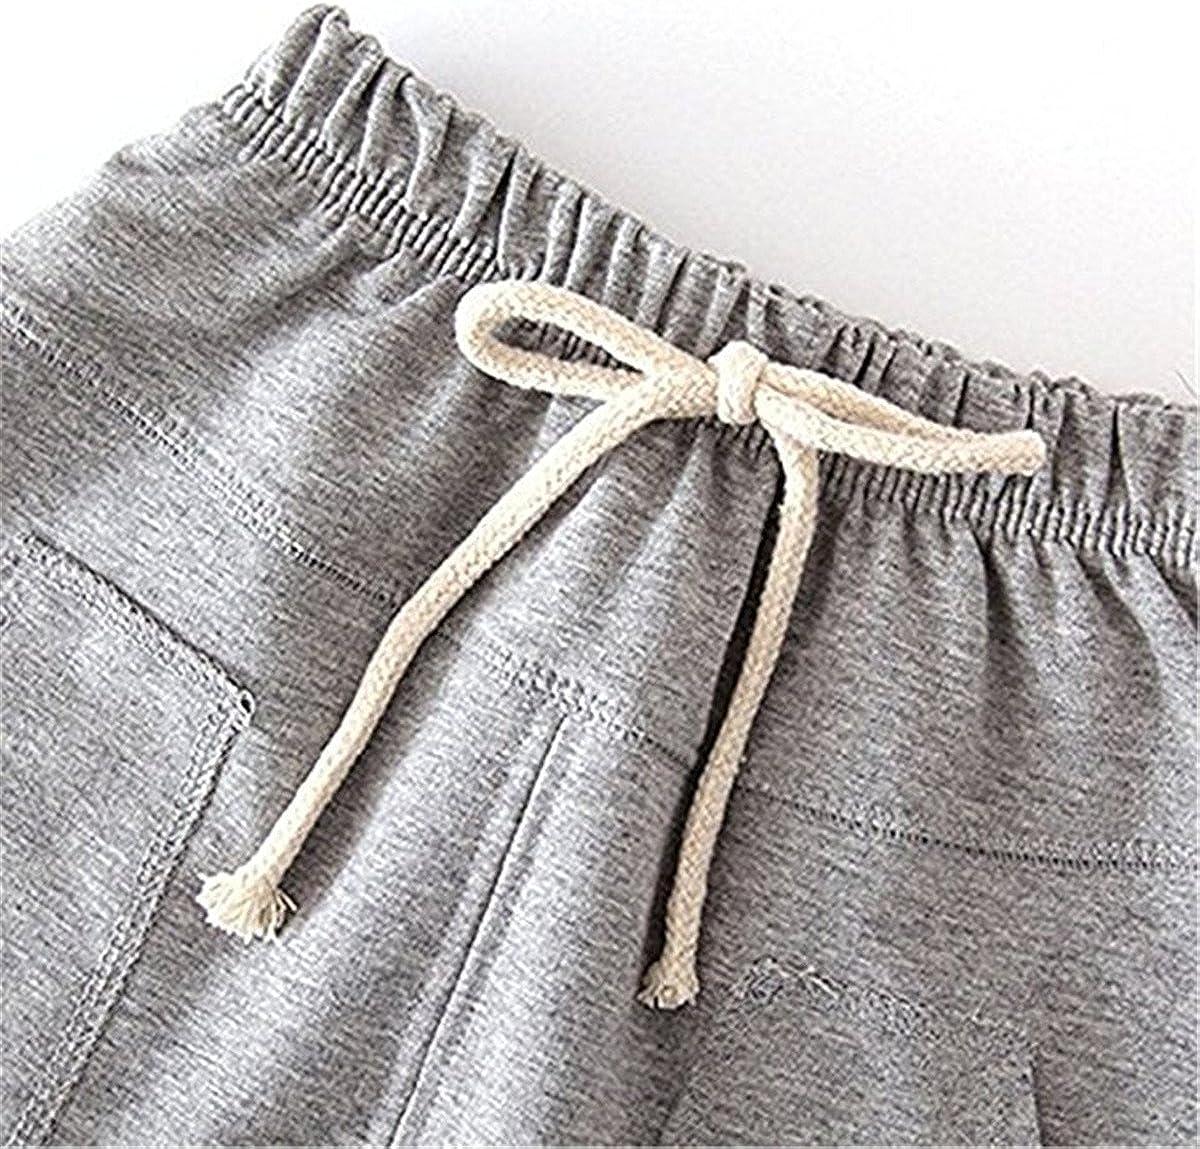 REWANGOING 2 Pack of Little Baby Boys Girls Cotton Hiphop Harem Pants Infant Sport Jogger